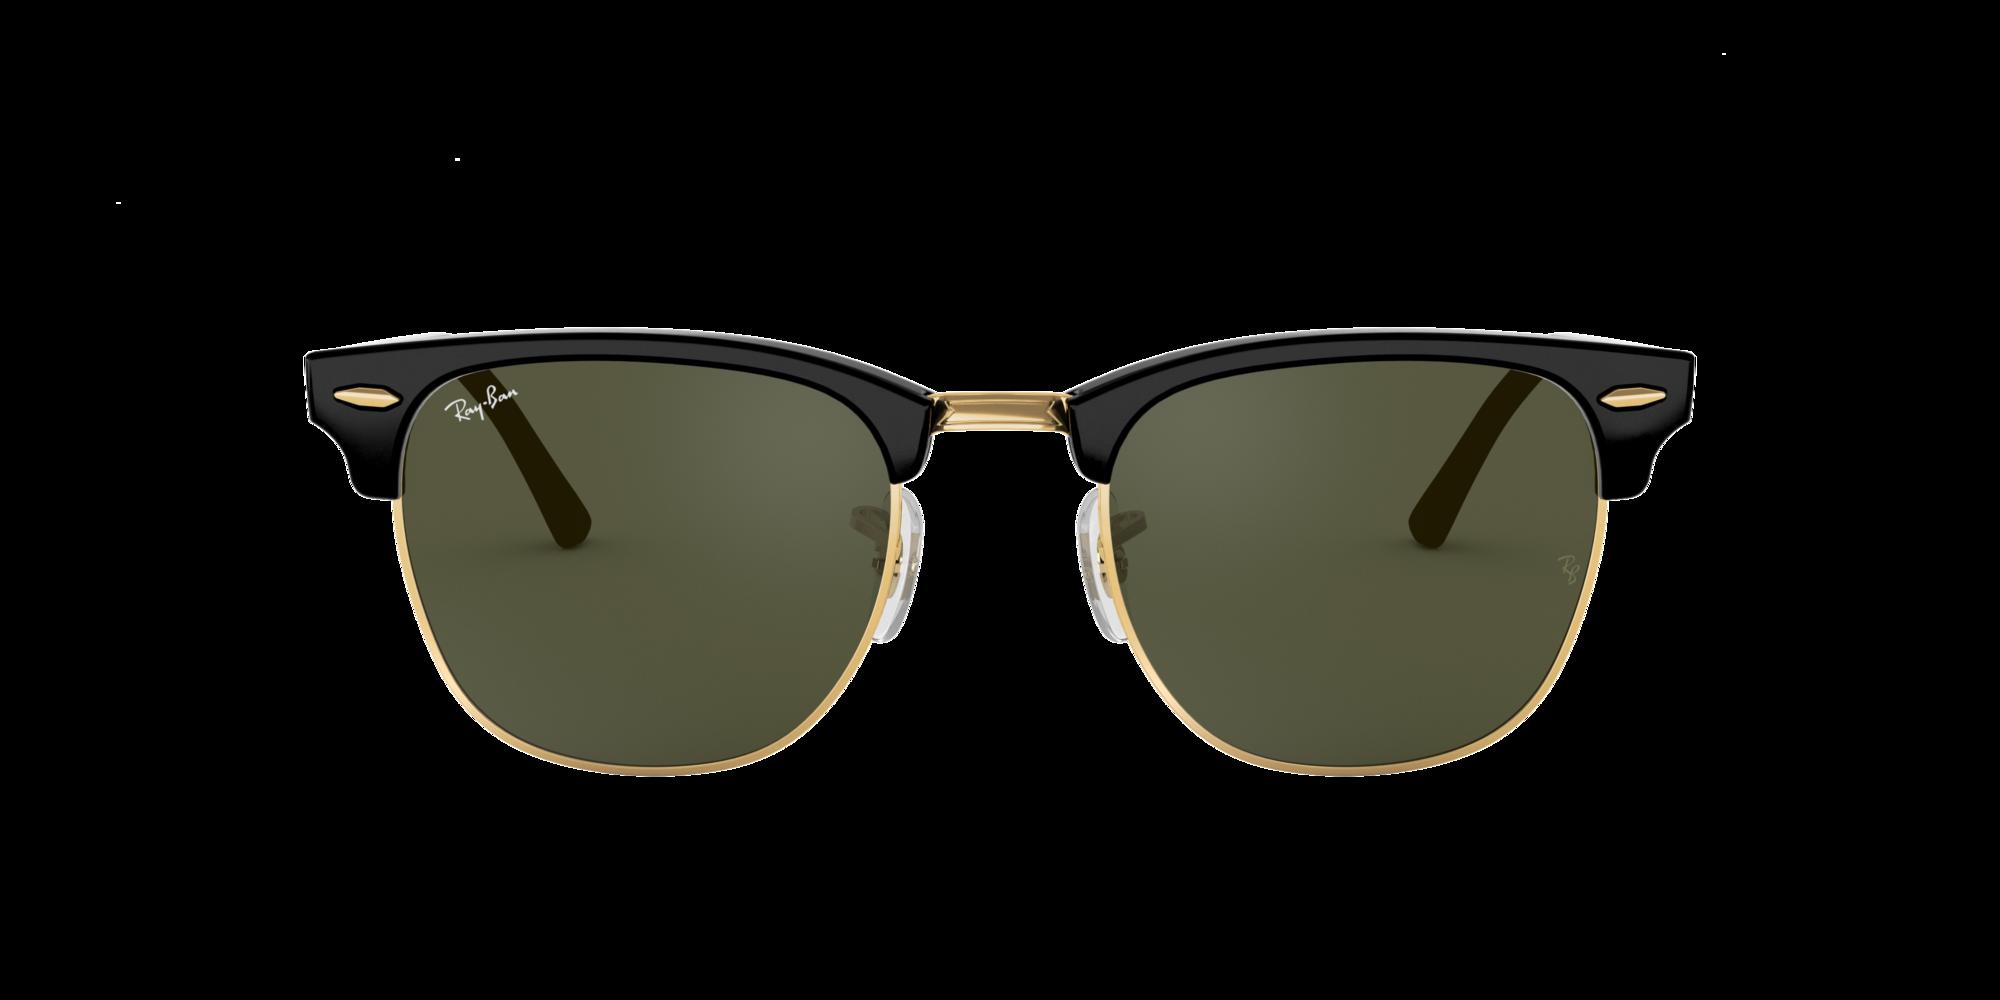 Image for RB3016 51 from LensCrafters | Glasses, Prescription Glasses Online, Eyewear